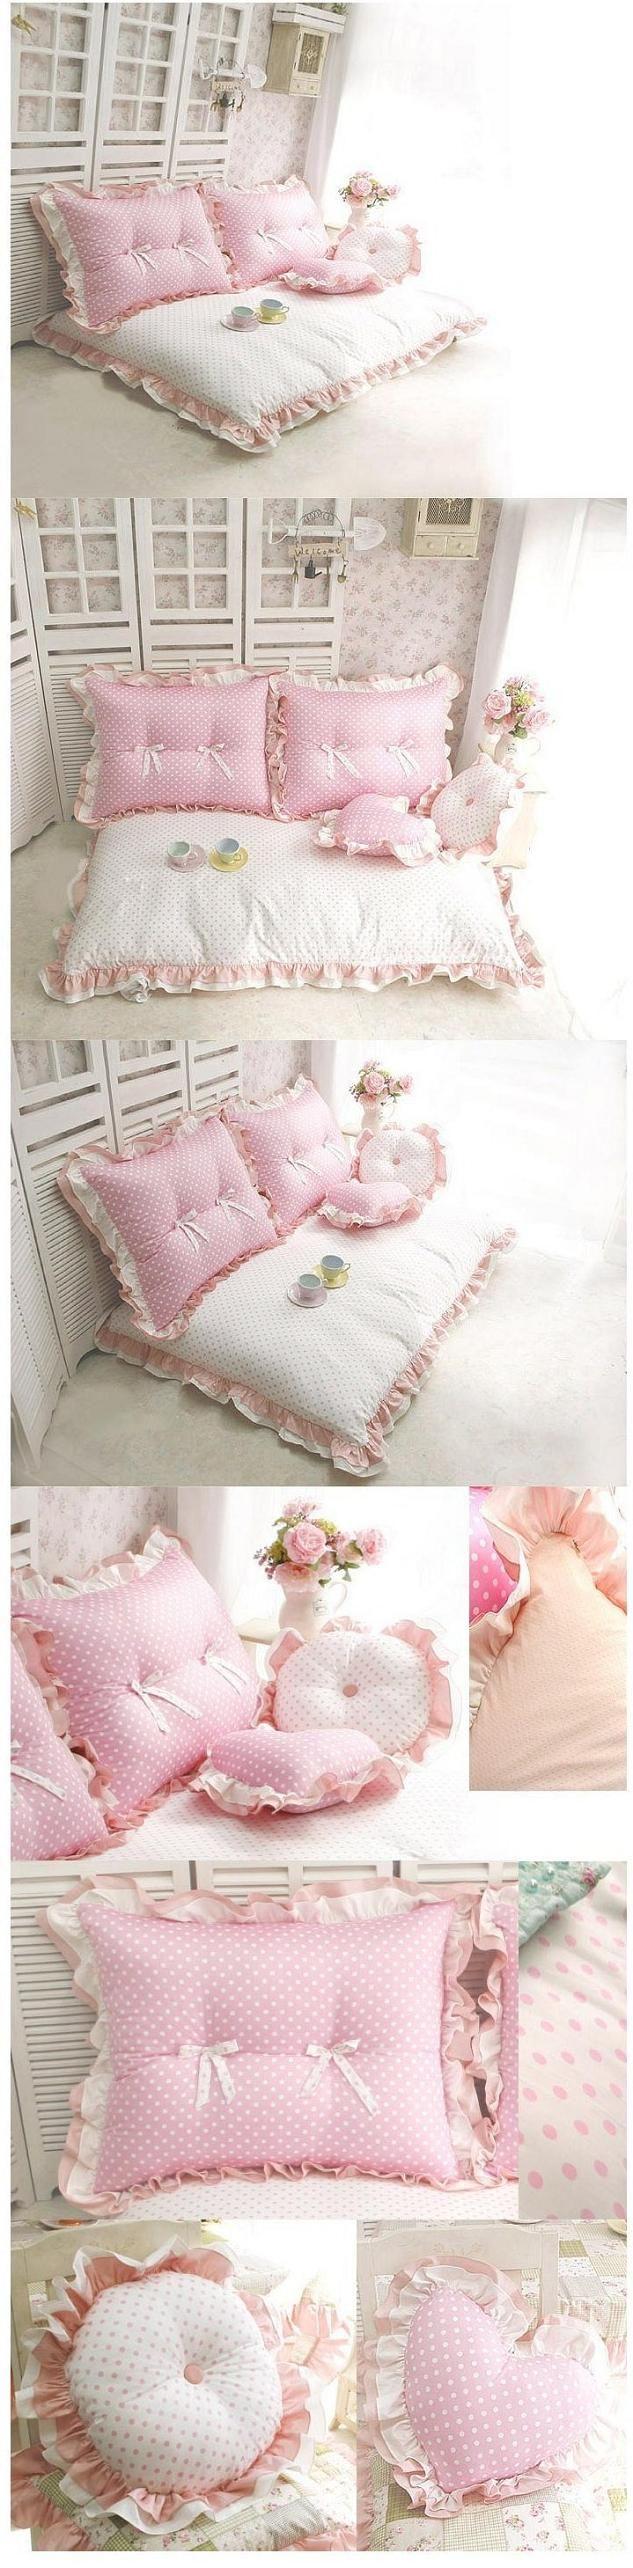 goodkorea.taobao floor cushion pillow set